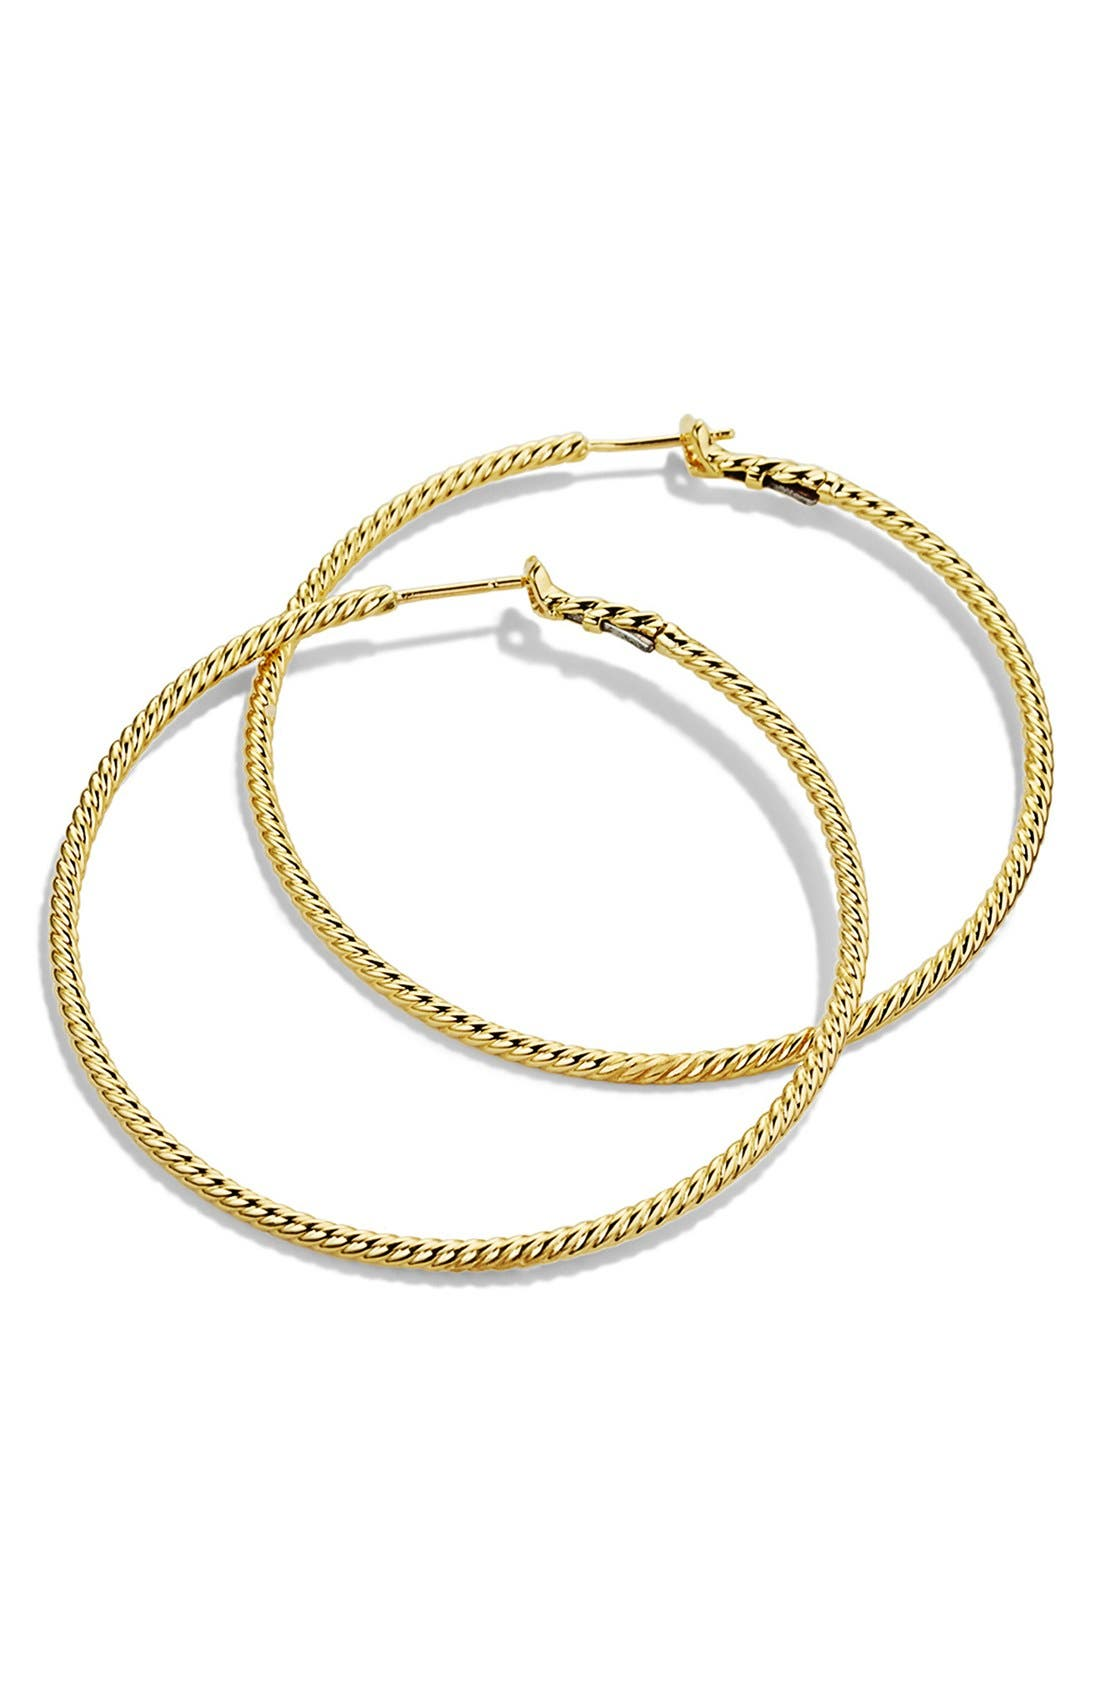 DAVID YURMAN, 'Cable Classics' Hoop Earrings in Gold, Alternate thumbnail 2, color, GOLD